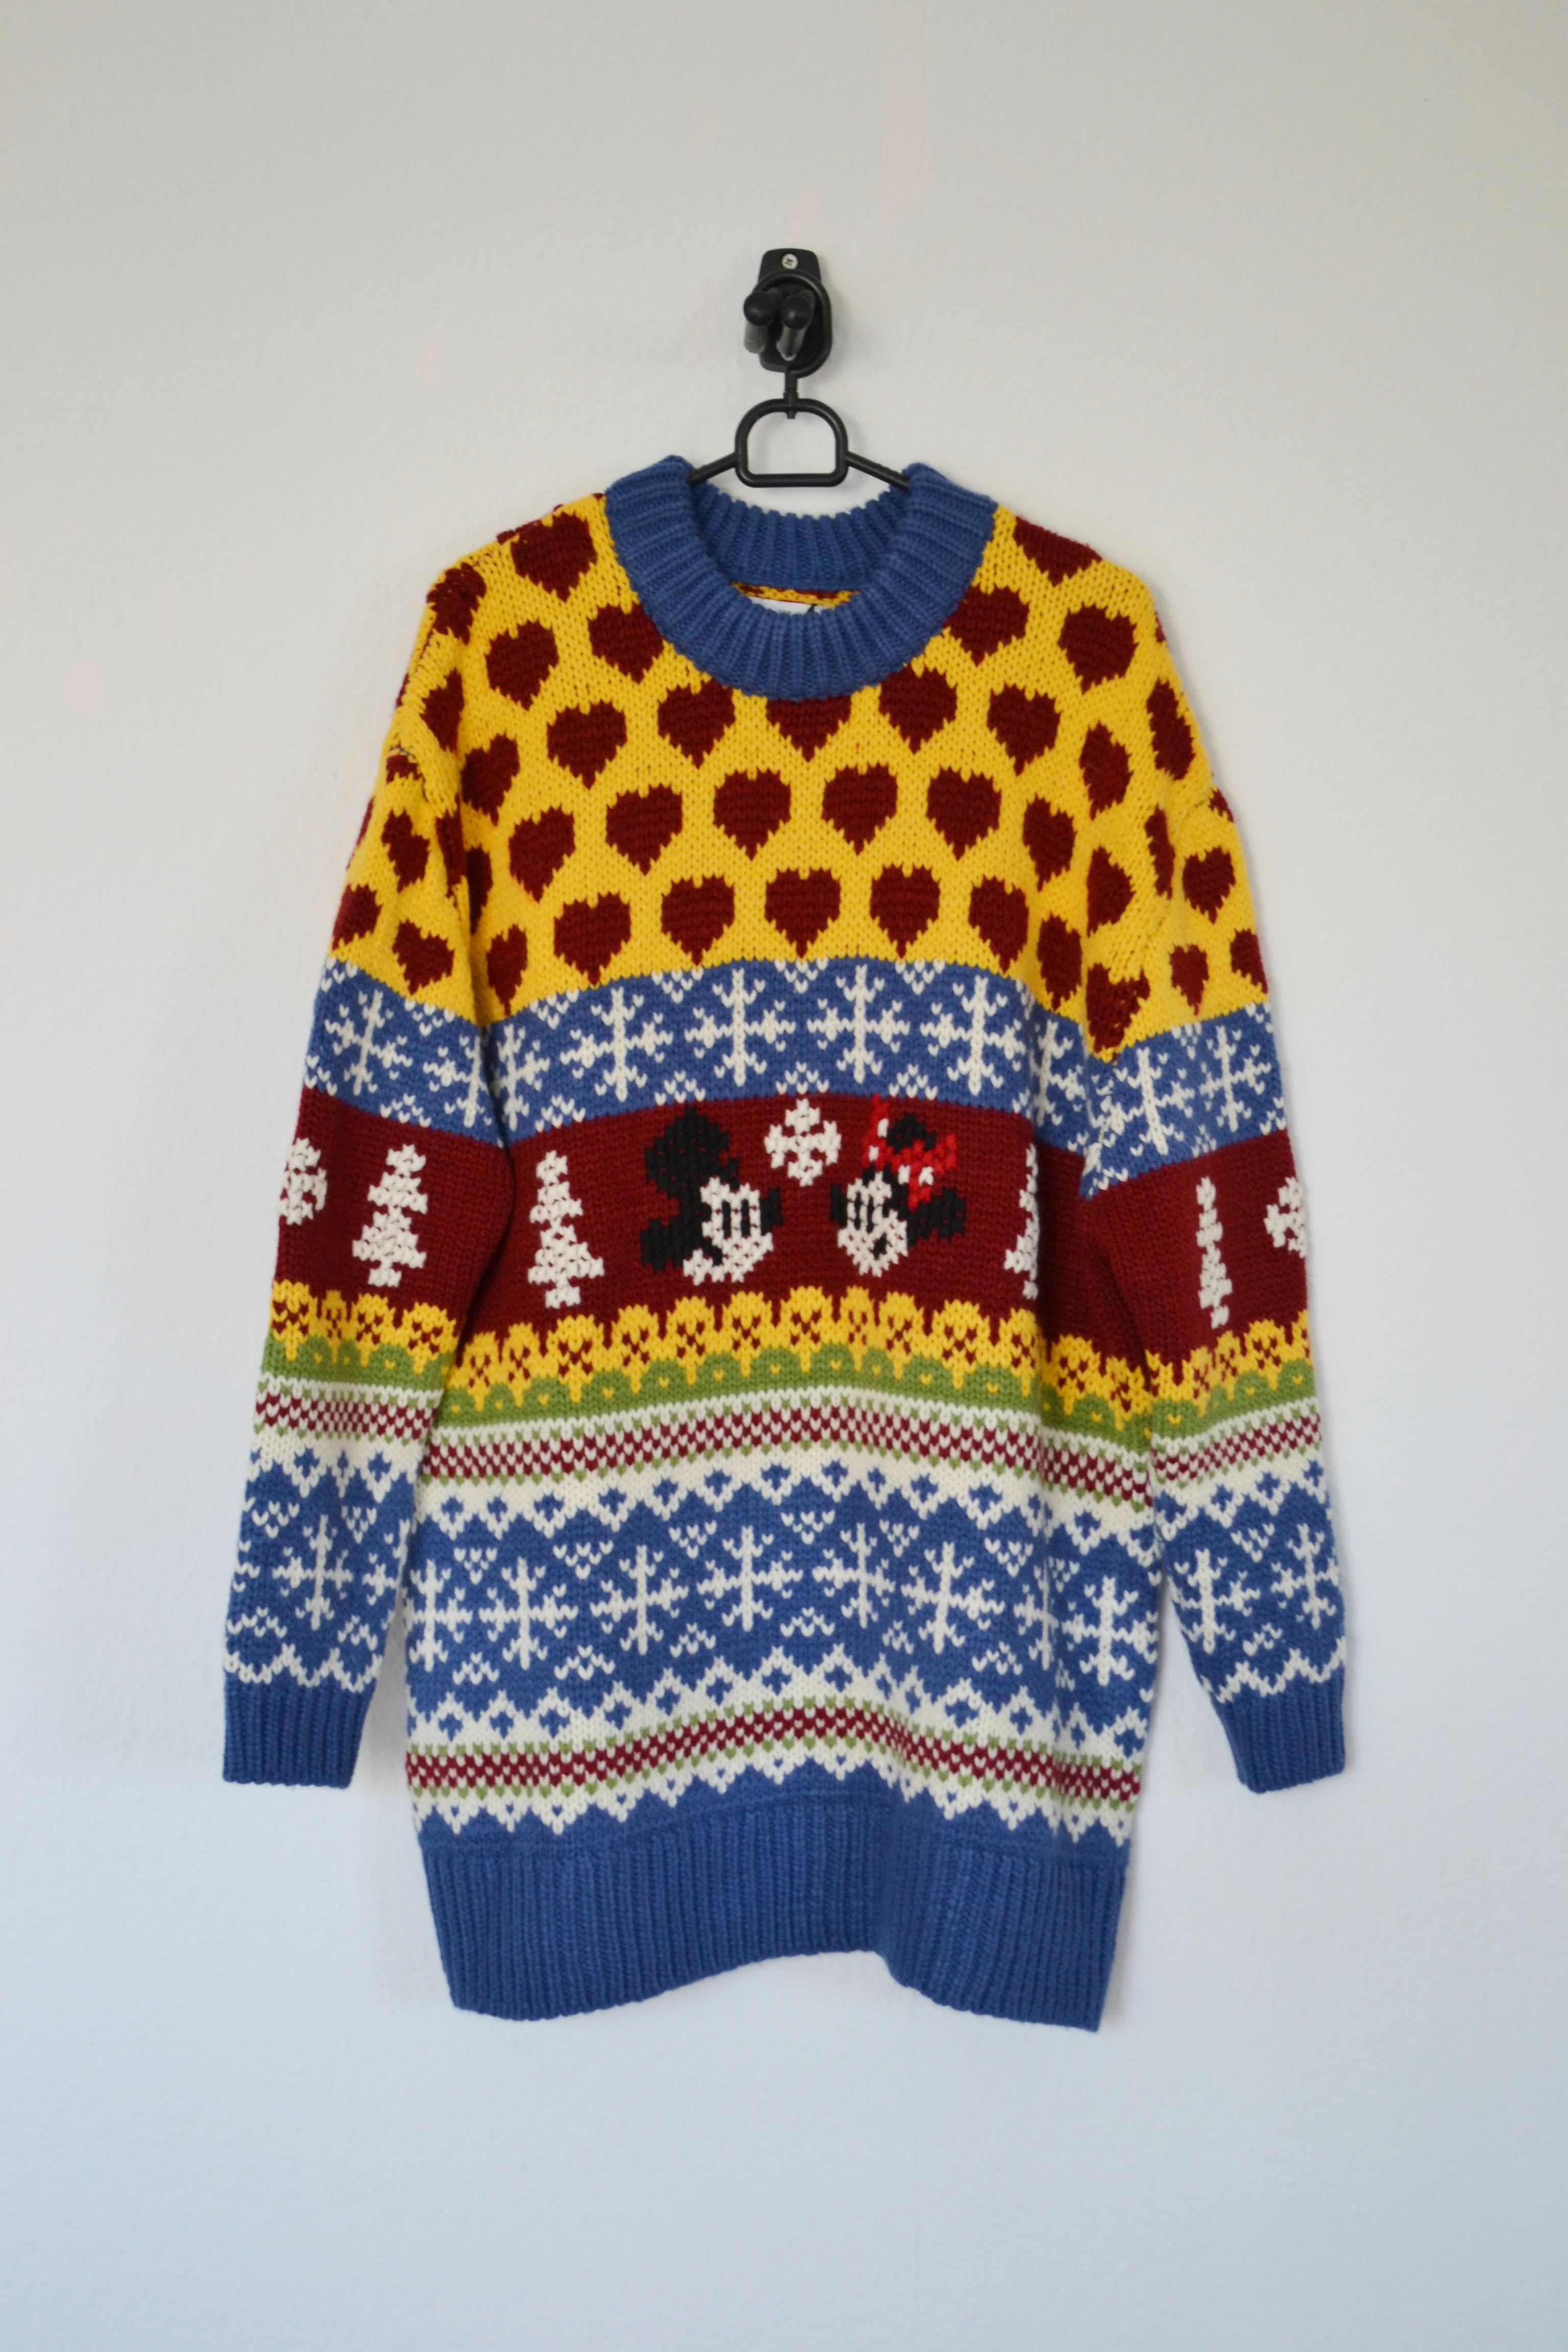 Blå, gul, rød og hvid oversized sweater m. Mickey og Minnie Mouse print - Zara